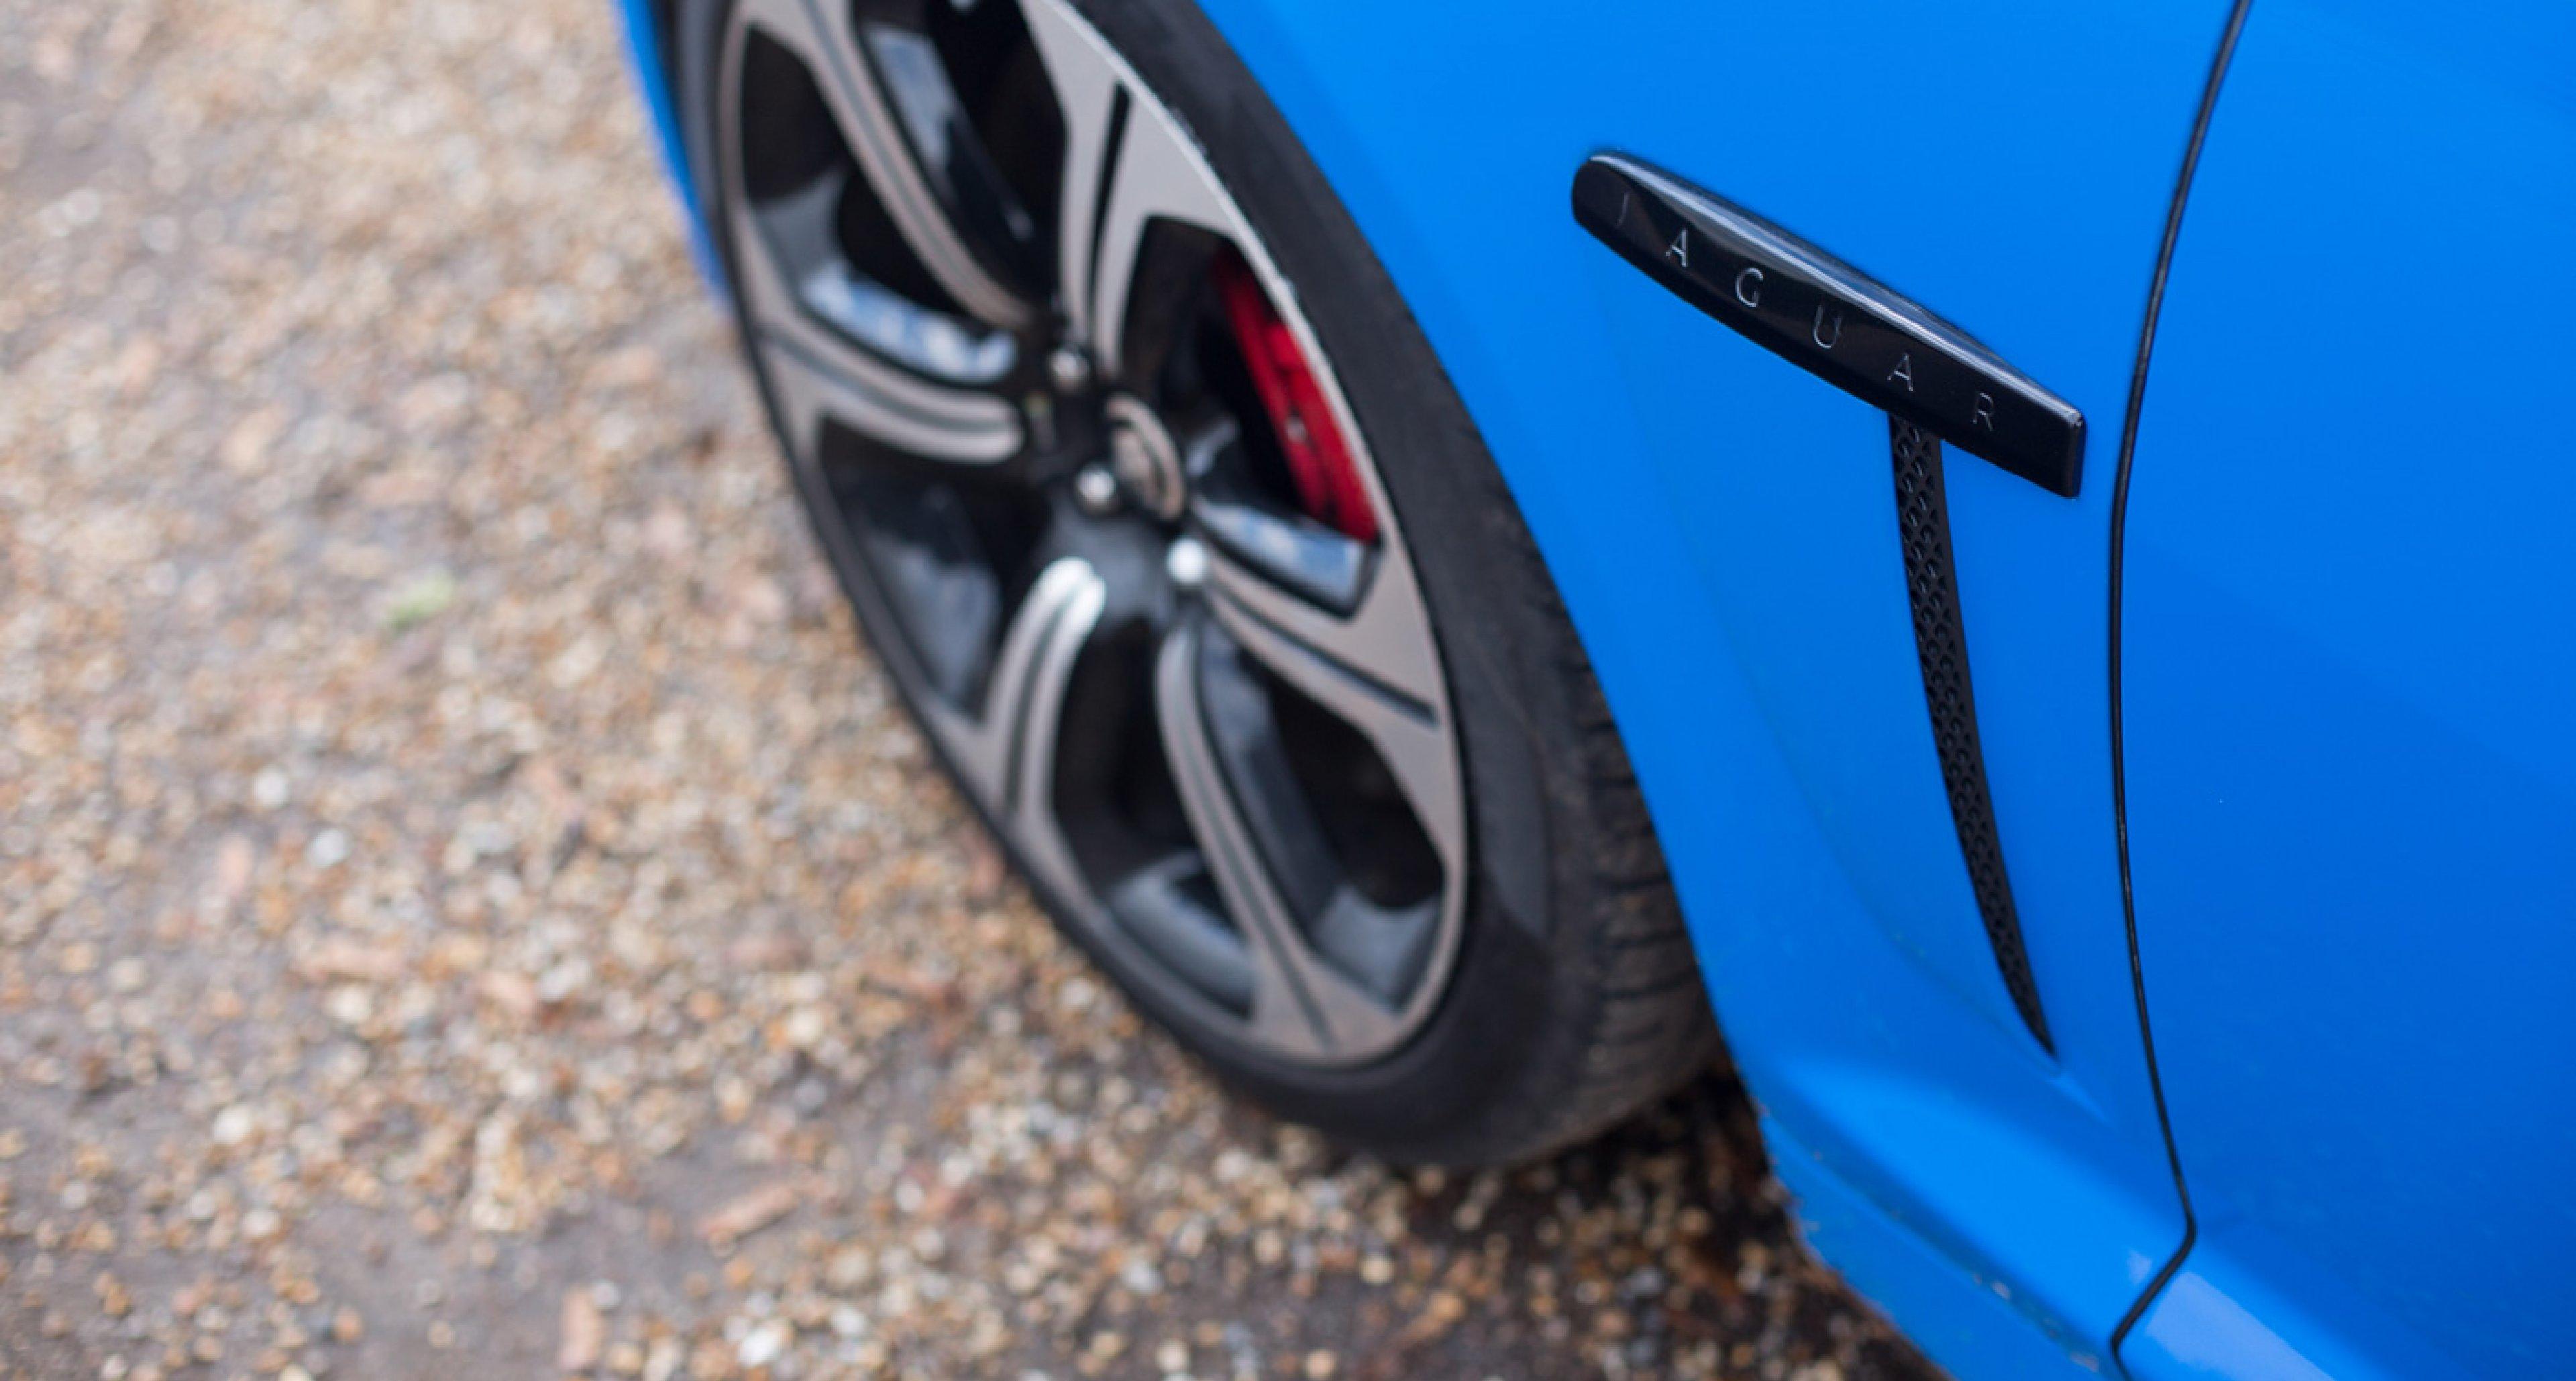 Jaguar XFR-S aero blade